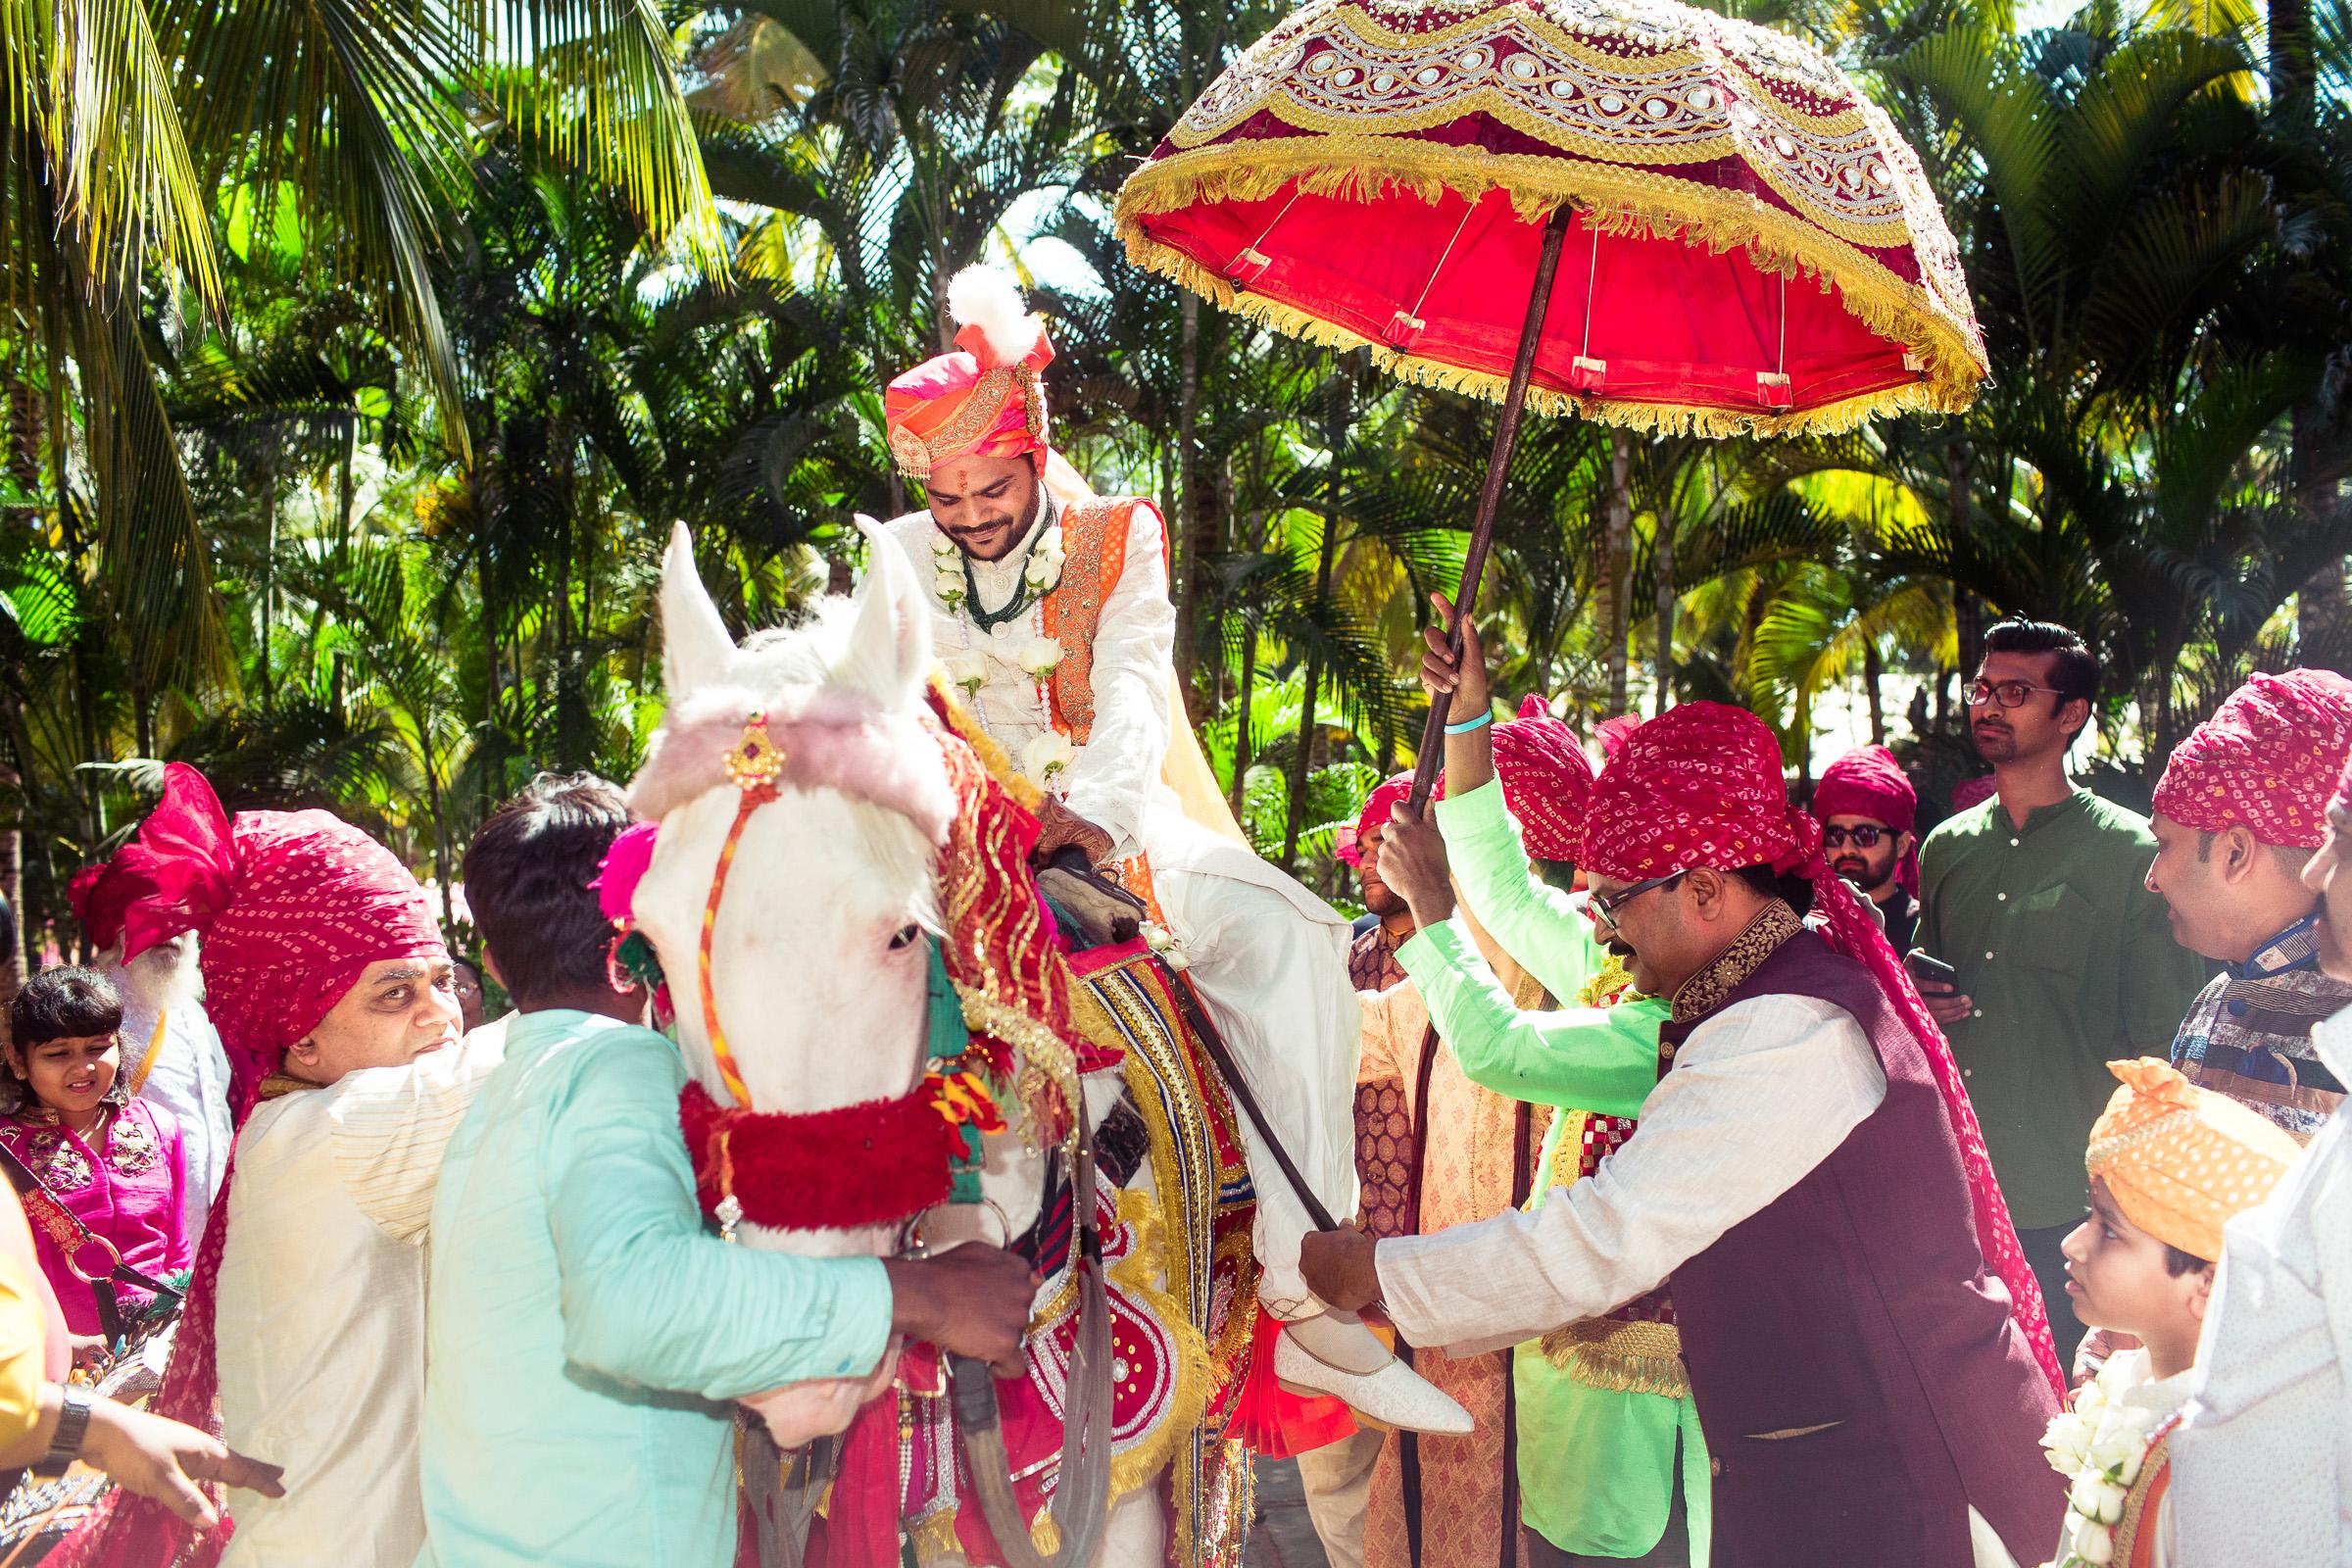 marwari-candid-wedding-photographers-bangalore-0016.jpg